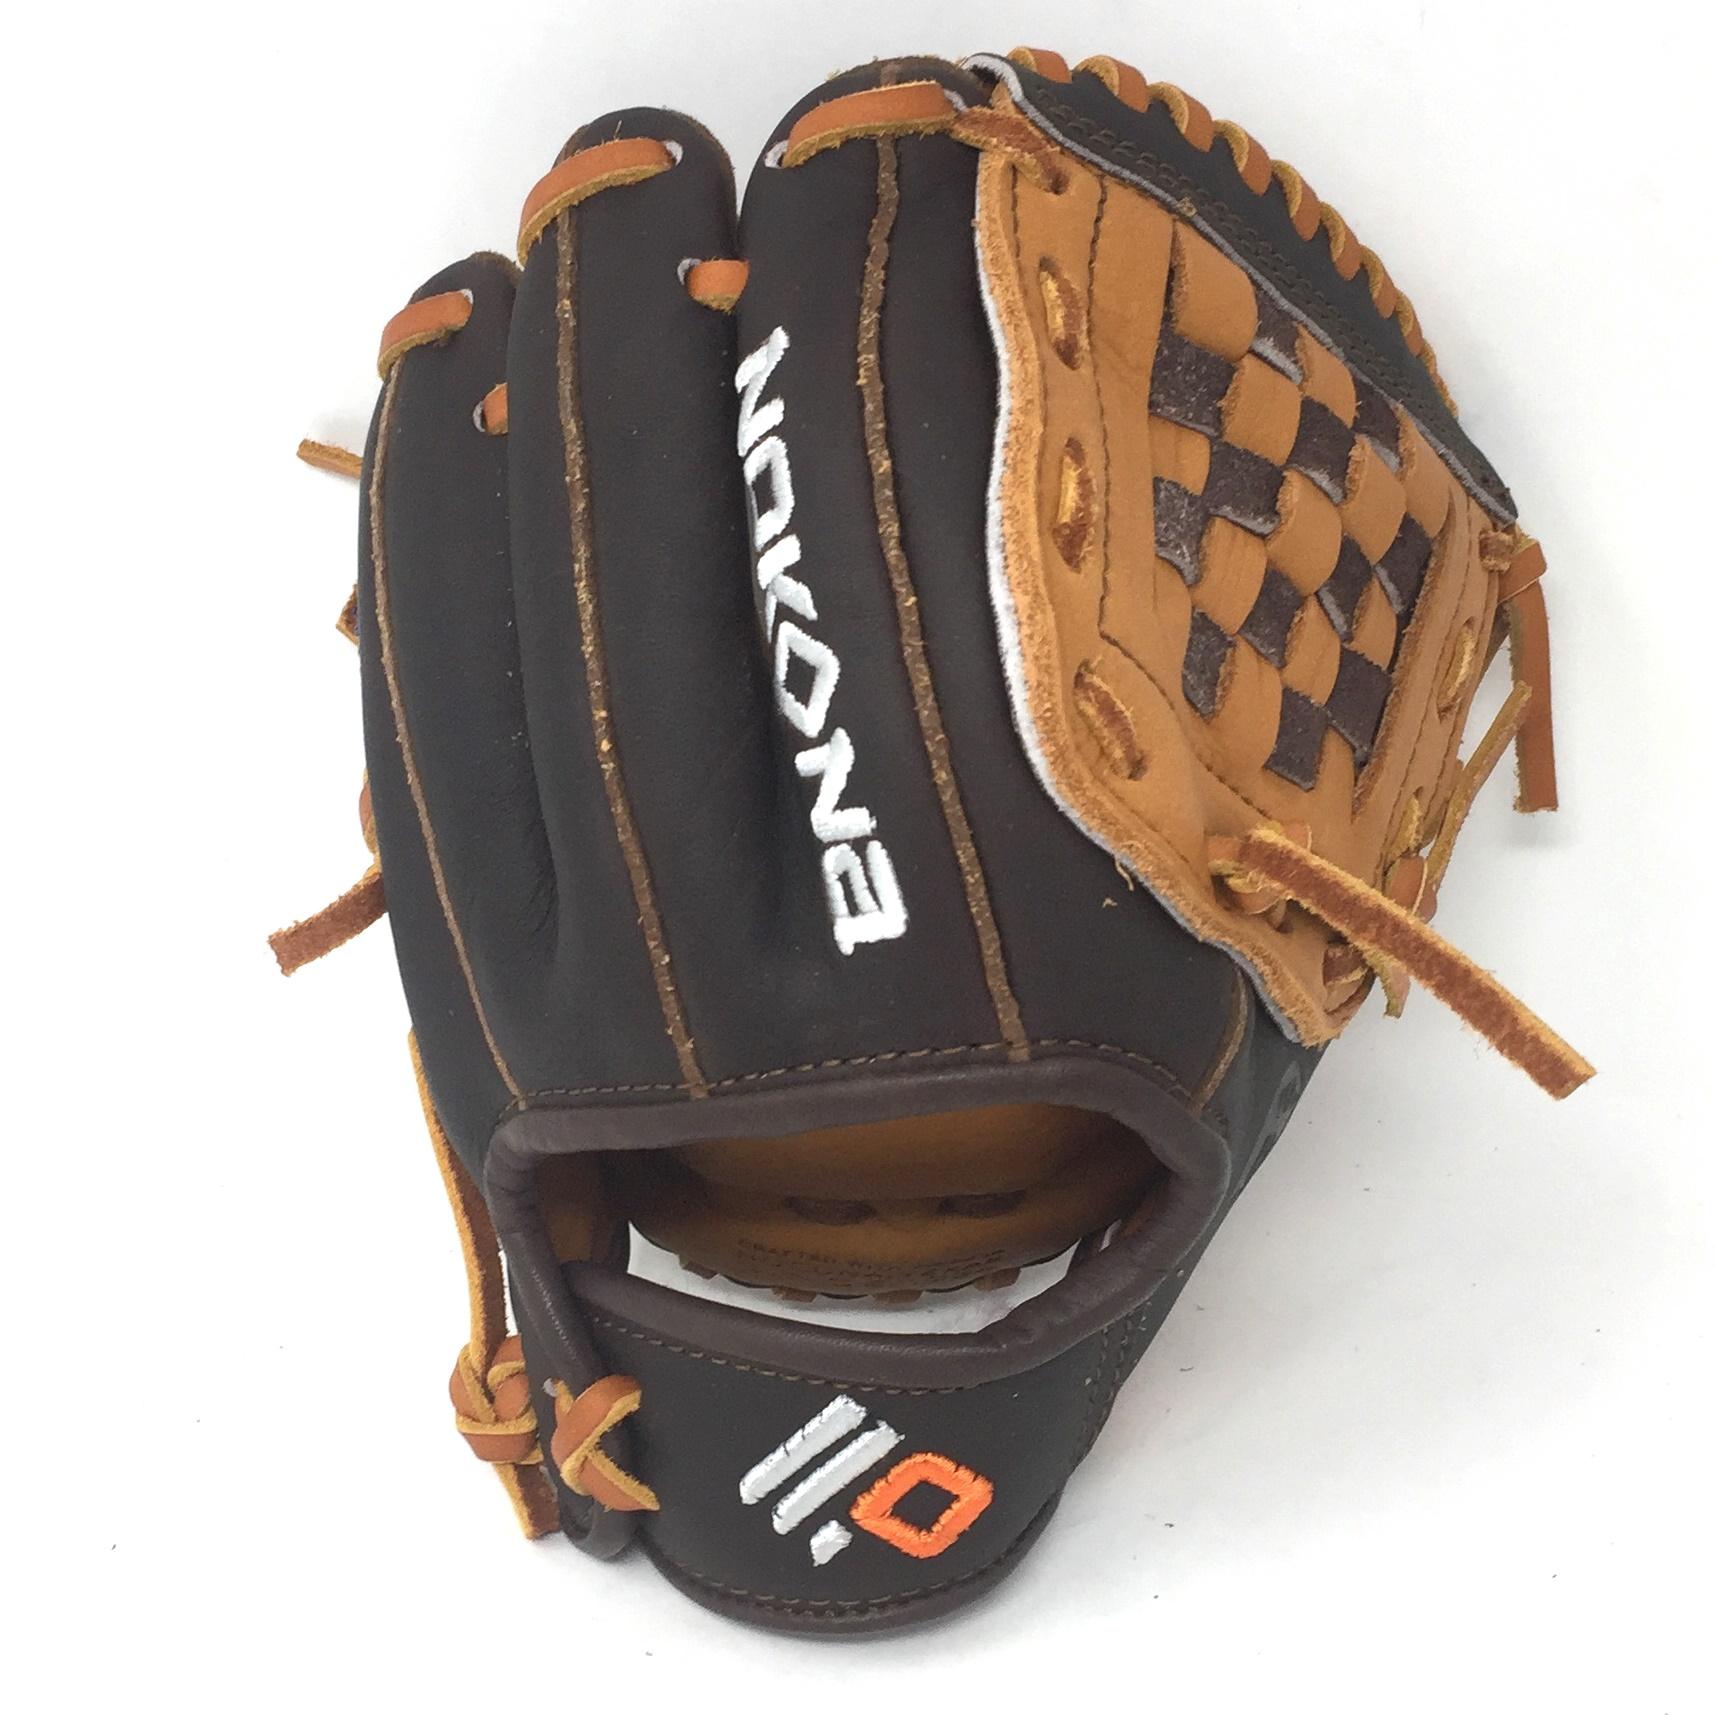 nokona-youth-alpha-baseball-glove-9-inch-right-hand-throw S-50C-2020-RightHandThrow  808808893783 Nokona Alpha 11.5 inch Baseball Glove. Right Hand Throw. The Alpha